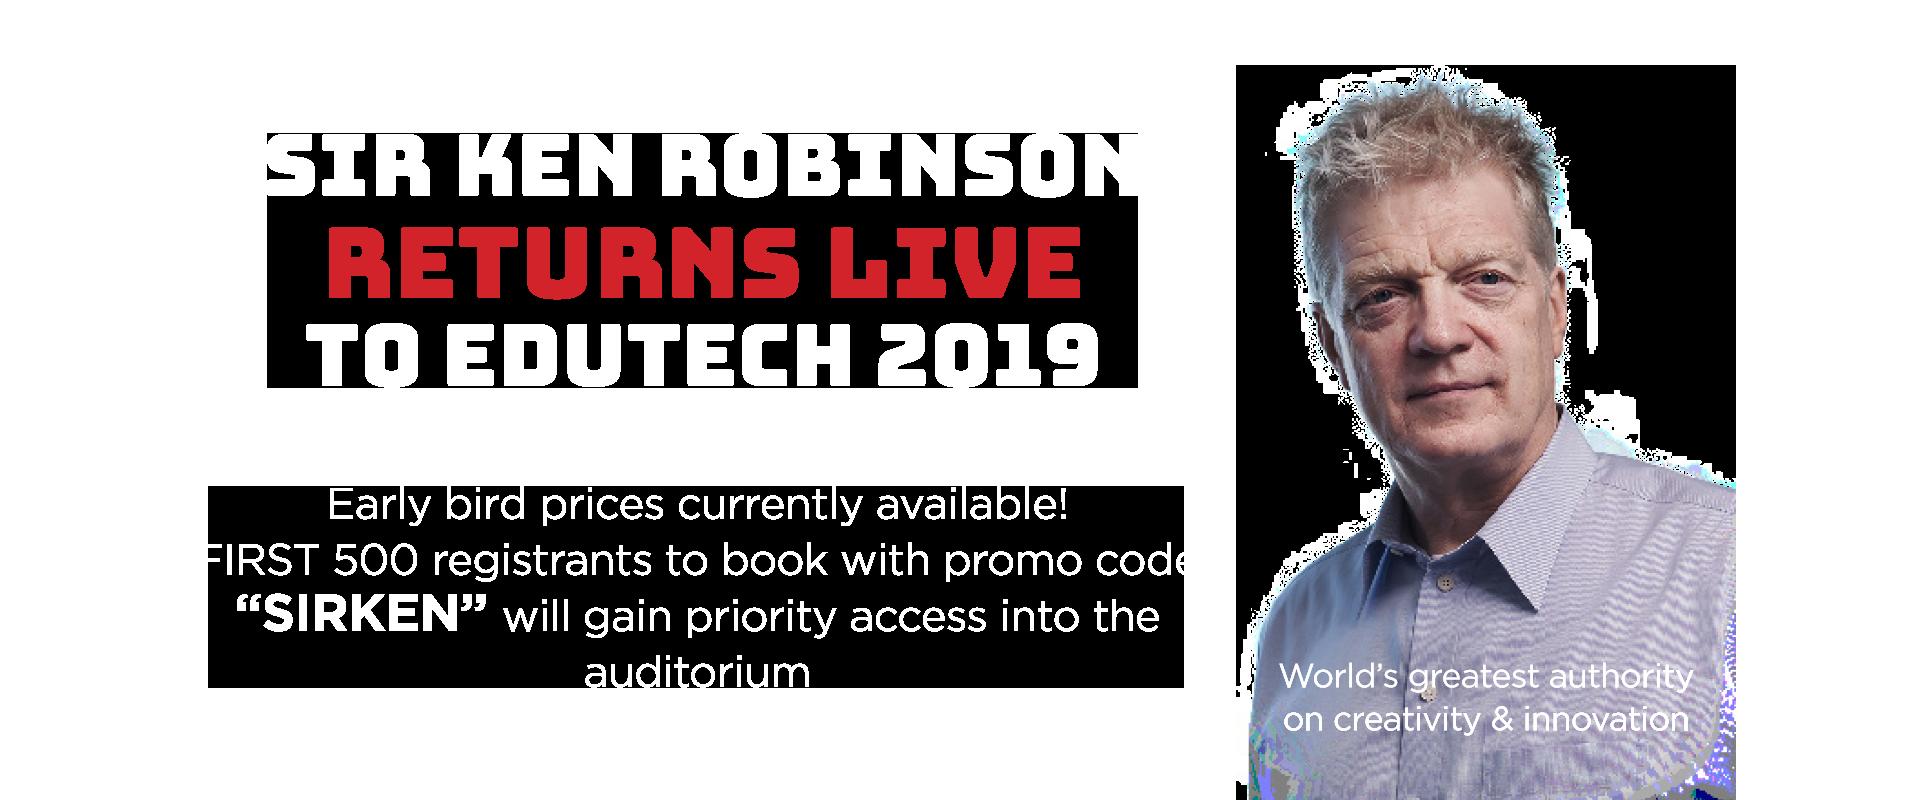 Sir Ken Robinson Coming to EduTECH 2019